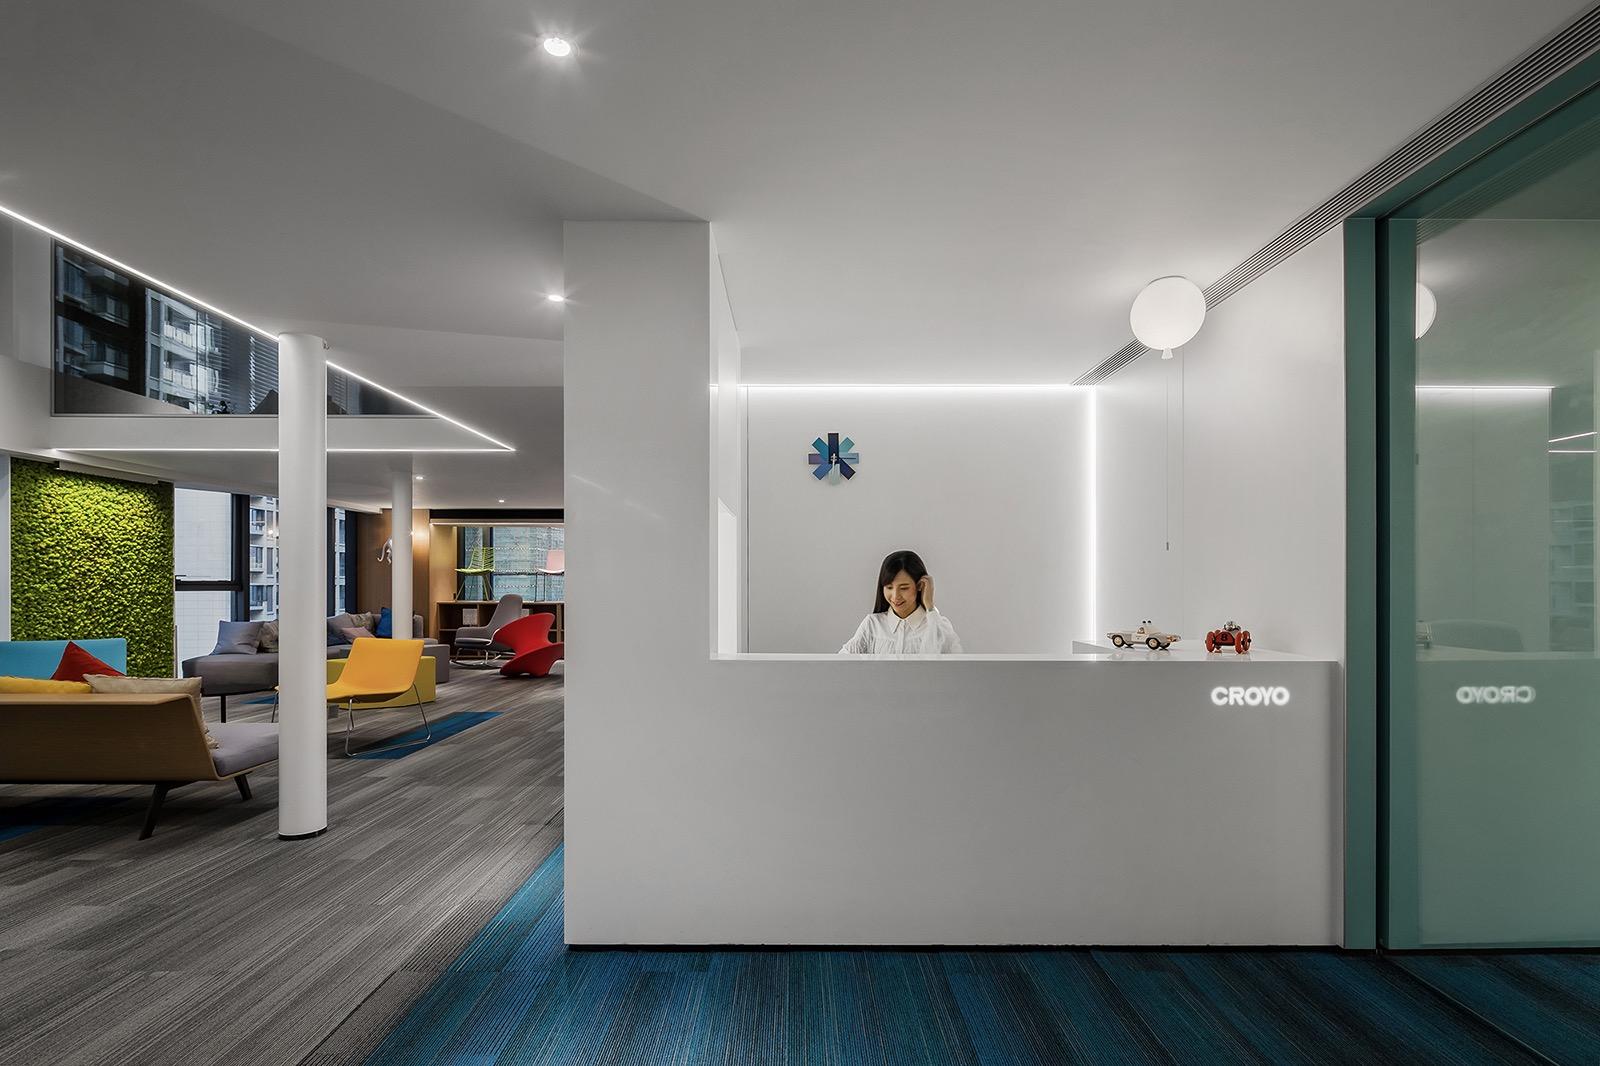 croyo-office-2